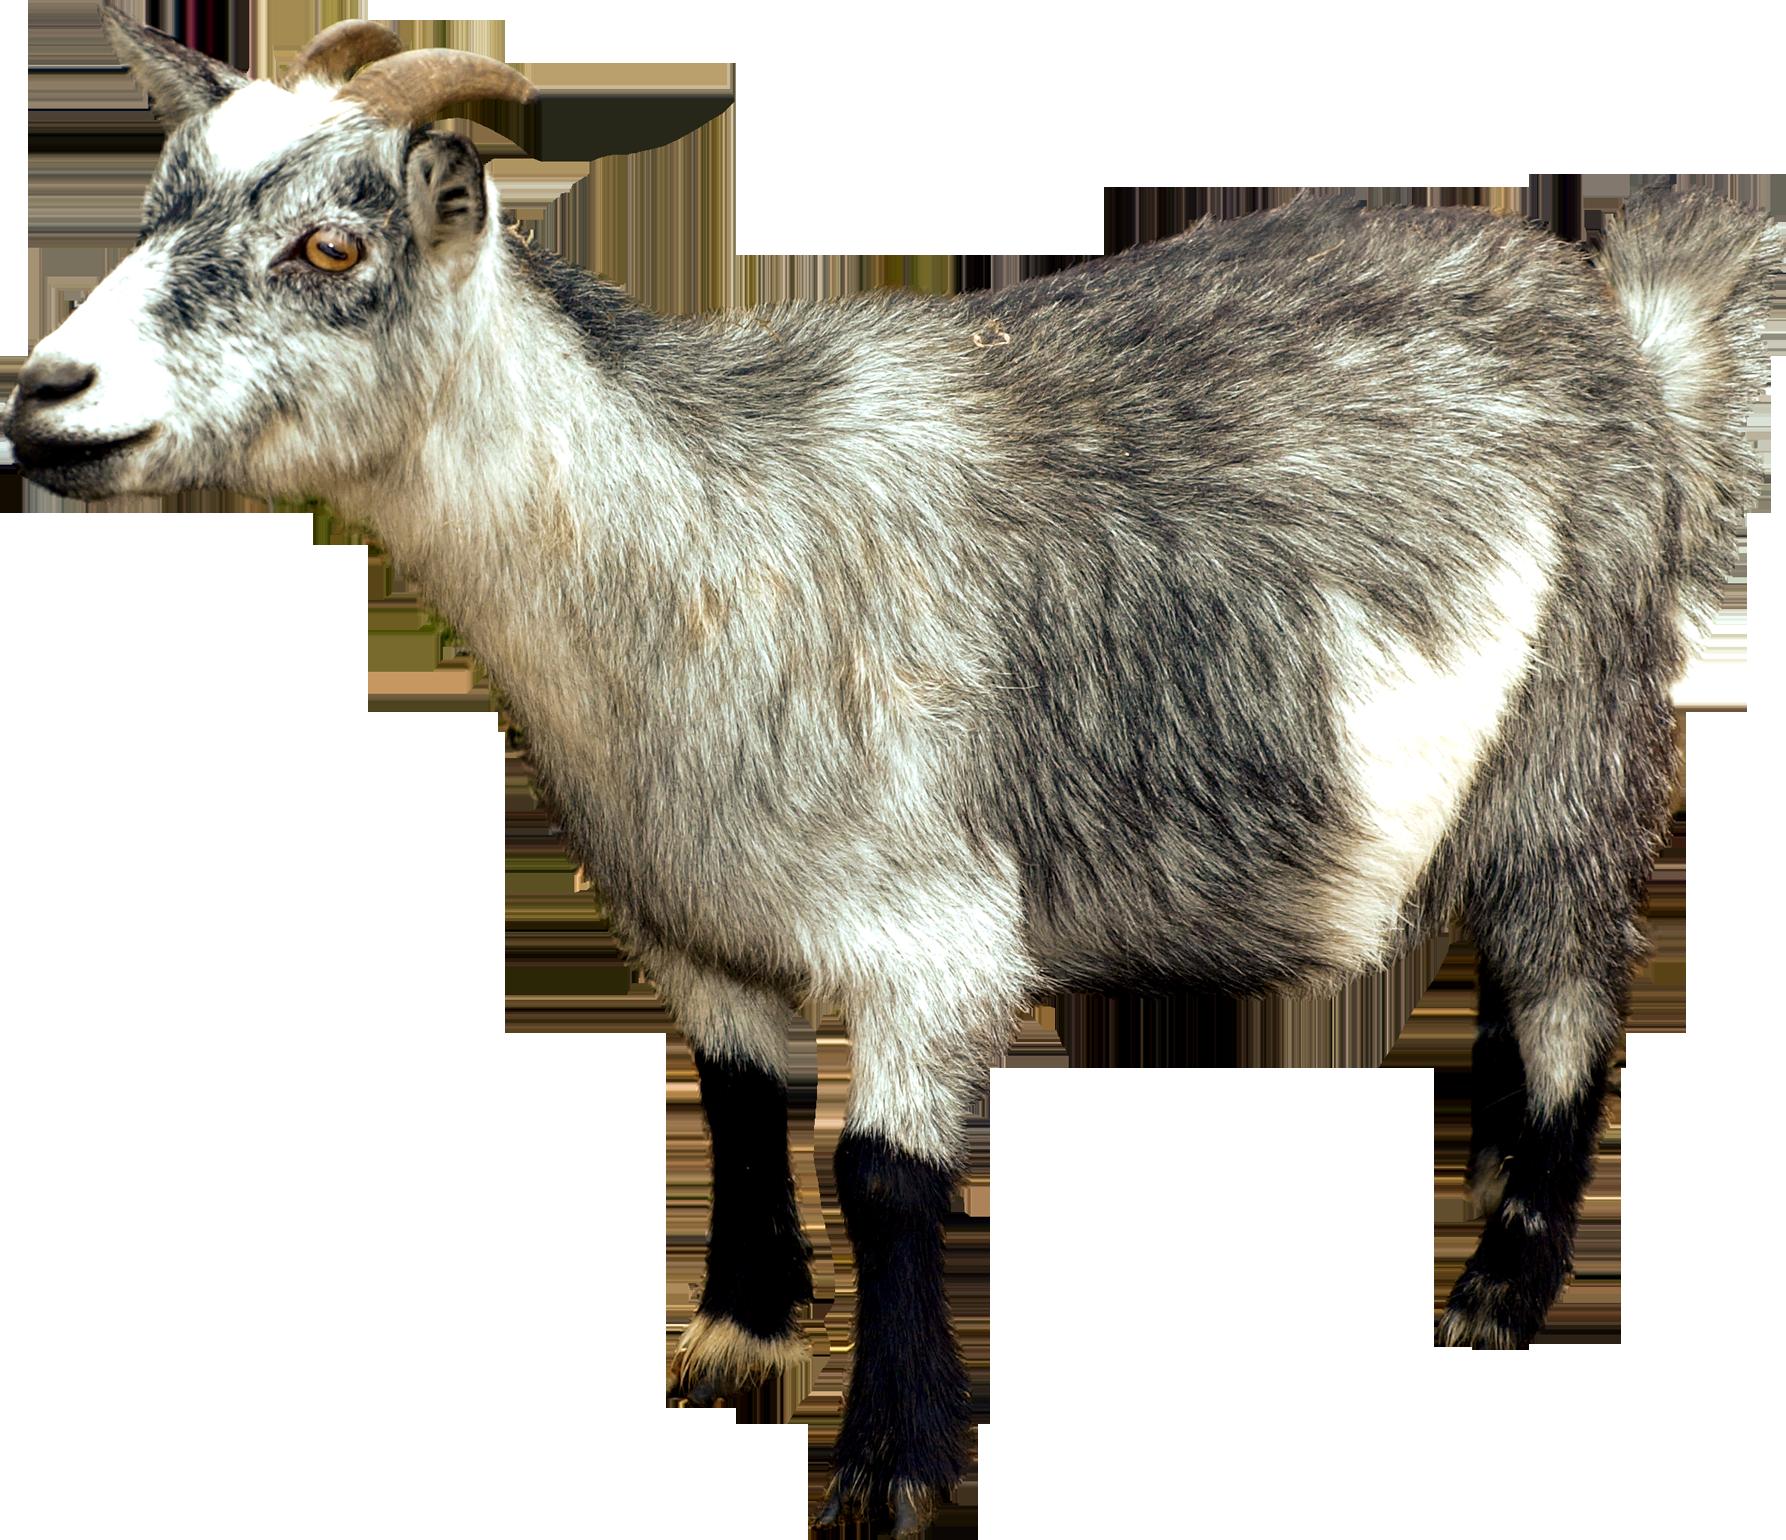 Goat PNG - 15760